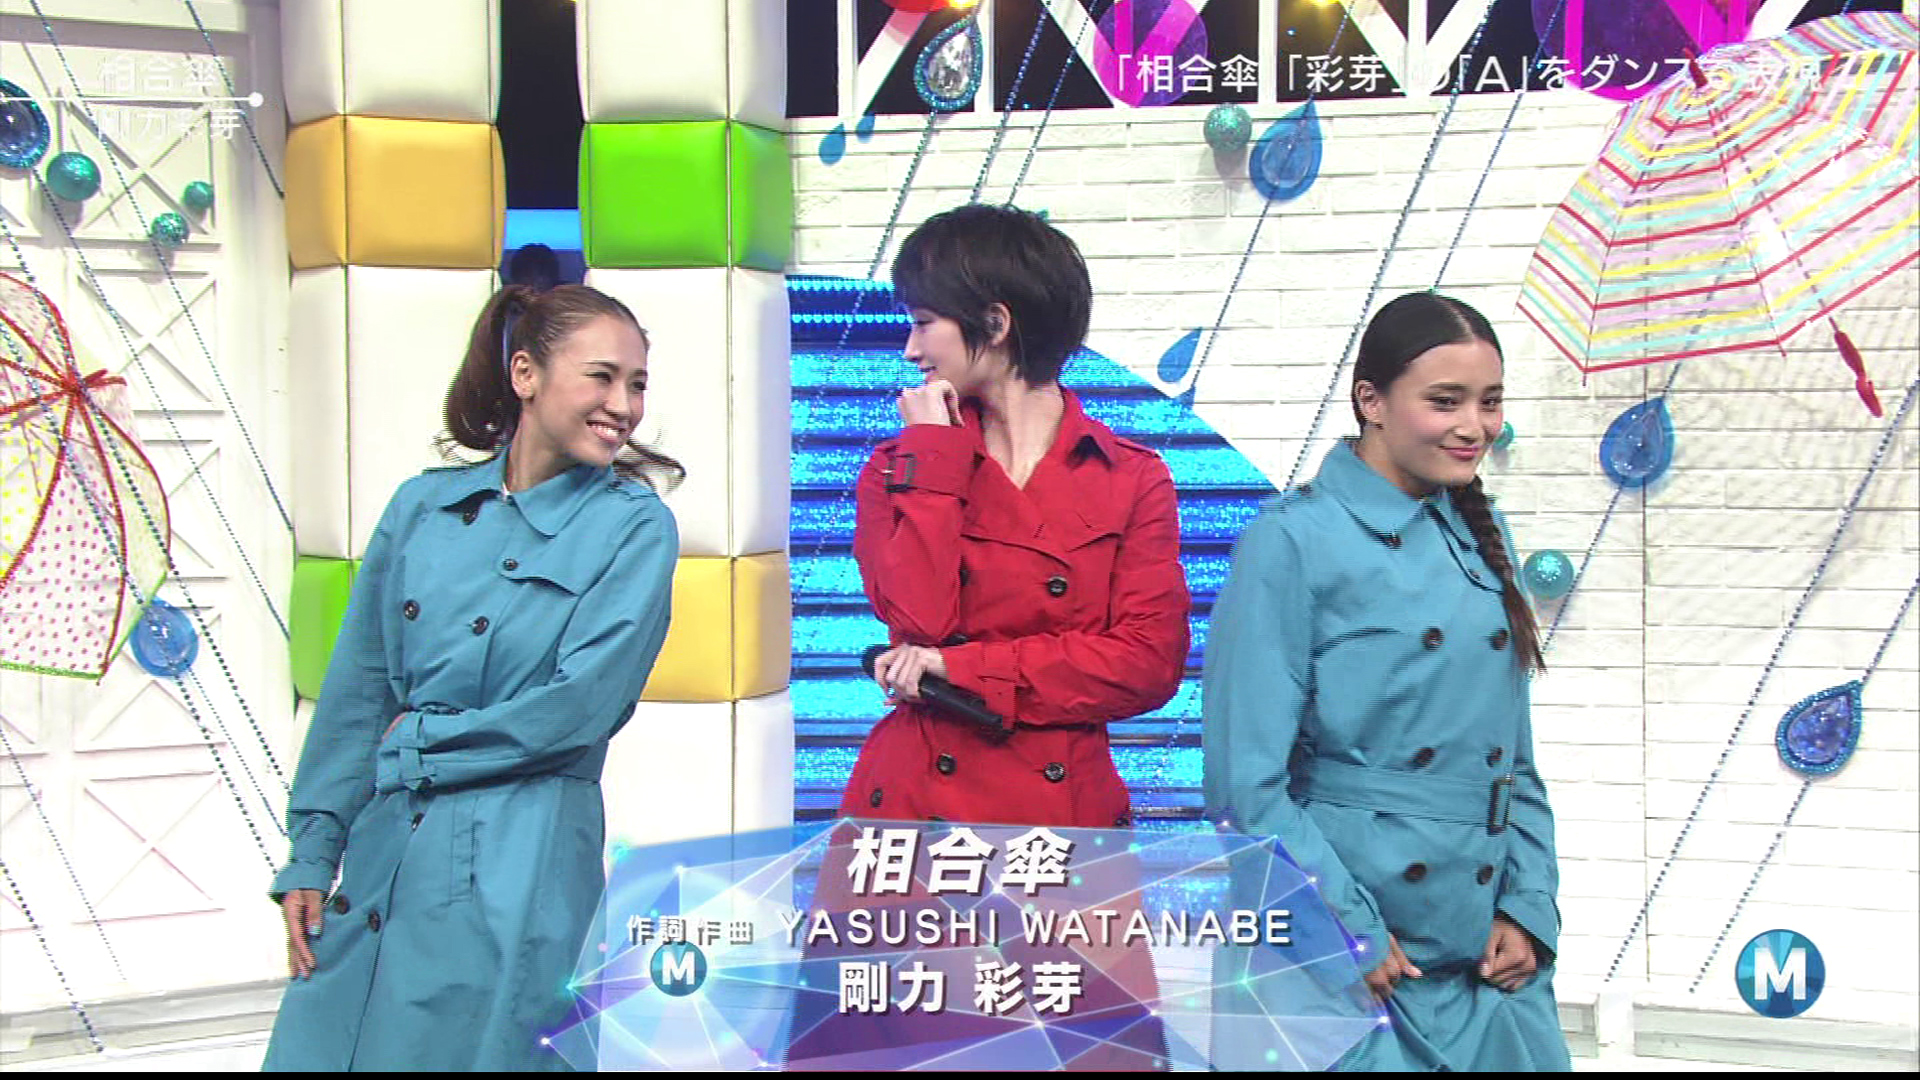 20160817.12.02 Ayame Goriki - Aiaigasa (Music Station 2015.09.11 HDTV) (JPOP.ru).ts 1.jpg